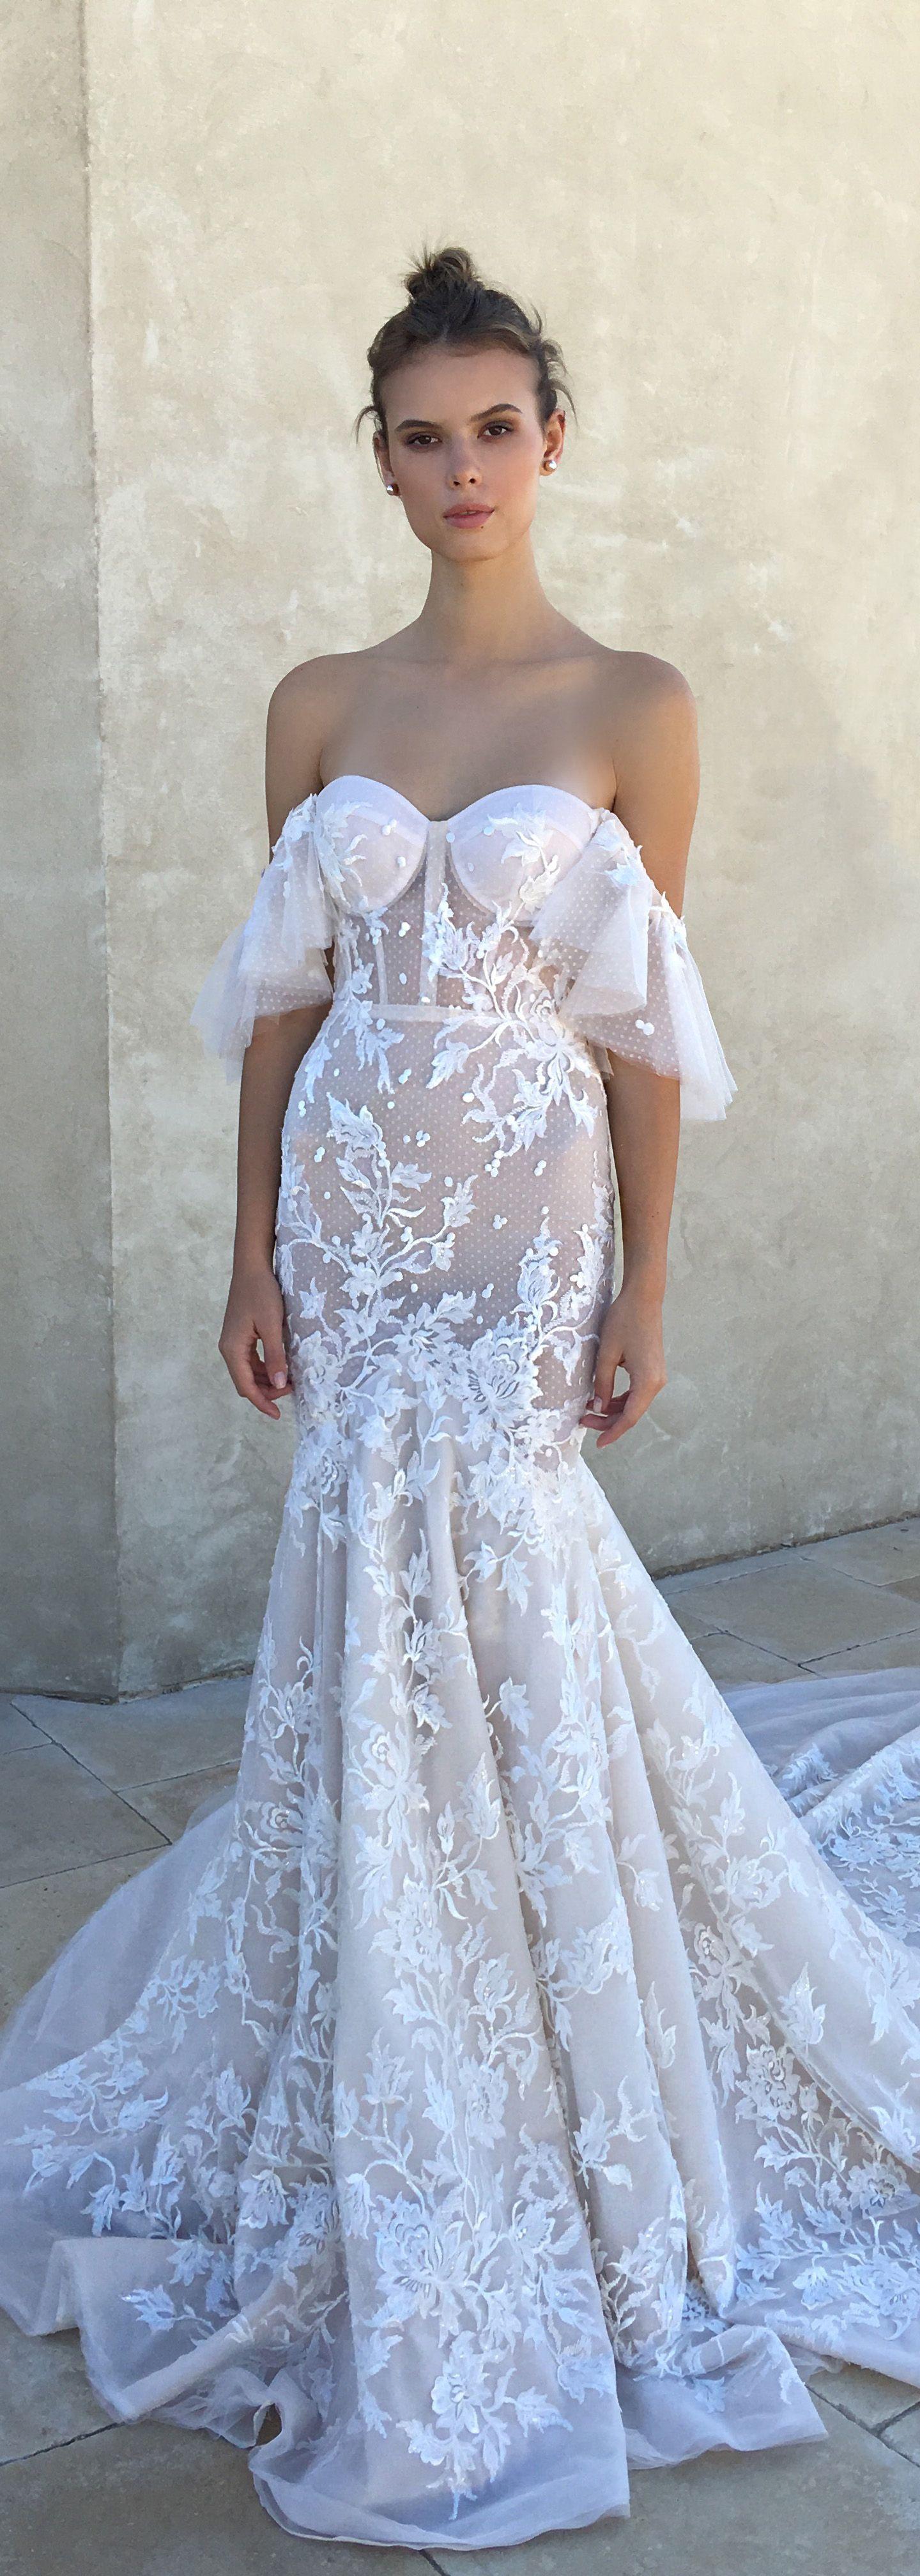 Berta behind the scenes uc coming soon wedding dresses